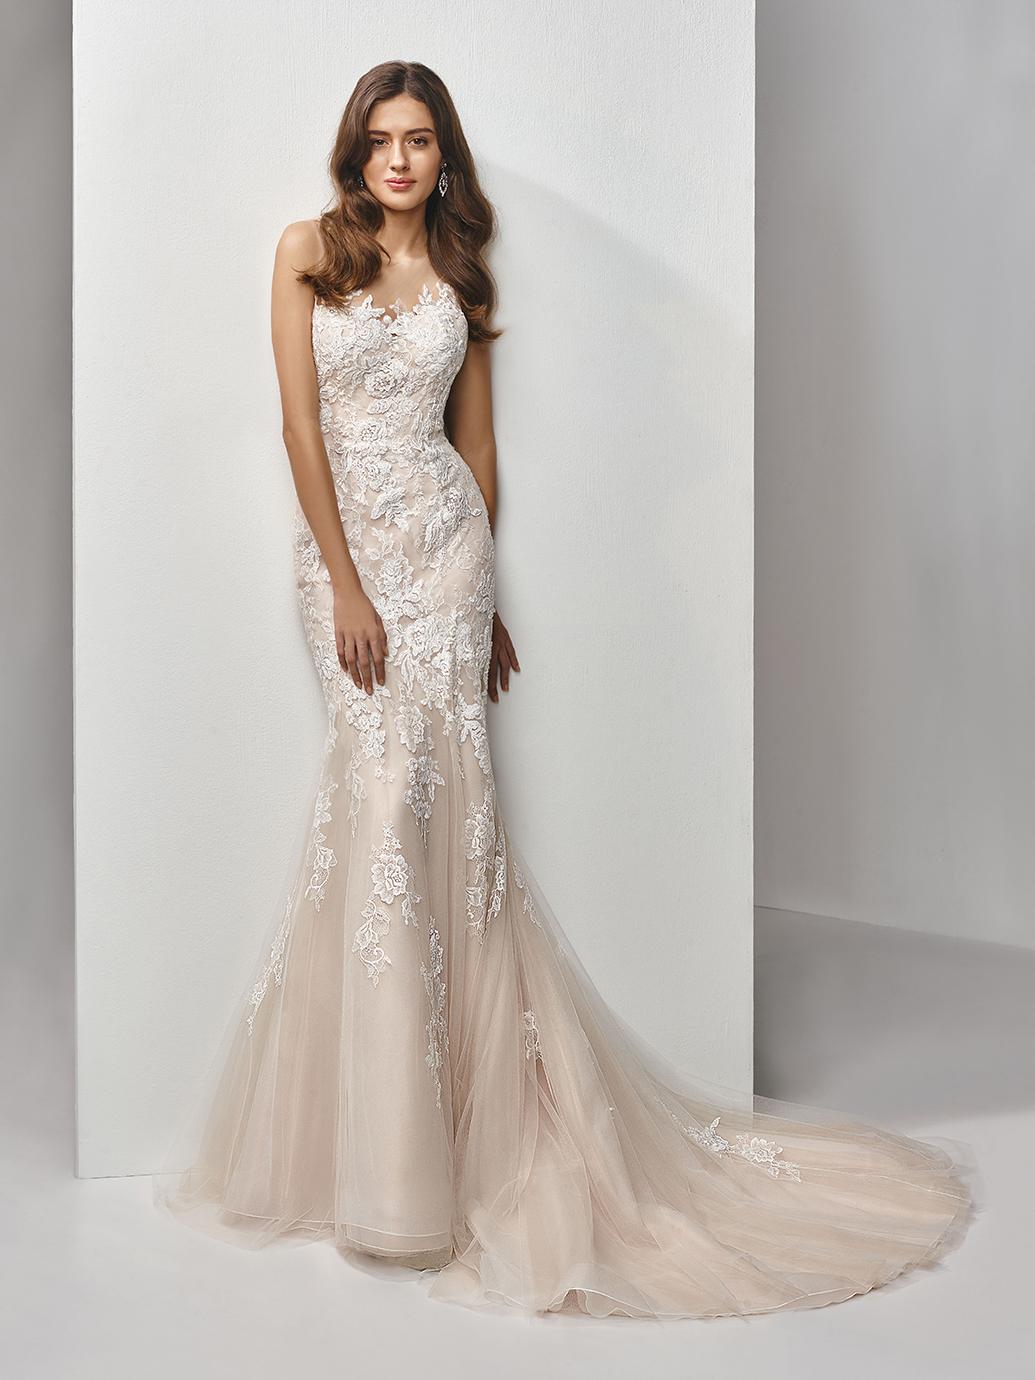 Enzoani Beautiful Wedding Dress, Fit and flare wedding dress, lace tattoo back wedding dress, sexy back wedding dress, mermaid wedding dress, high neck sheer tulle wedding dress